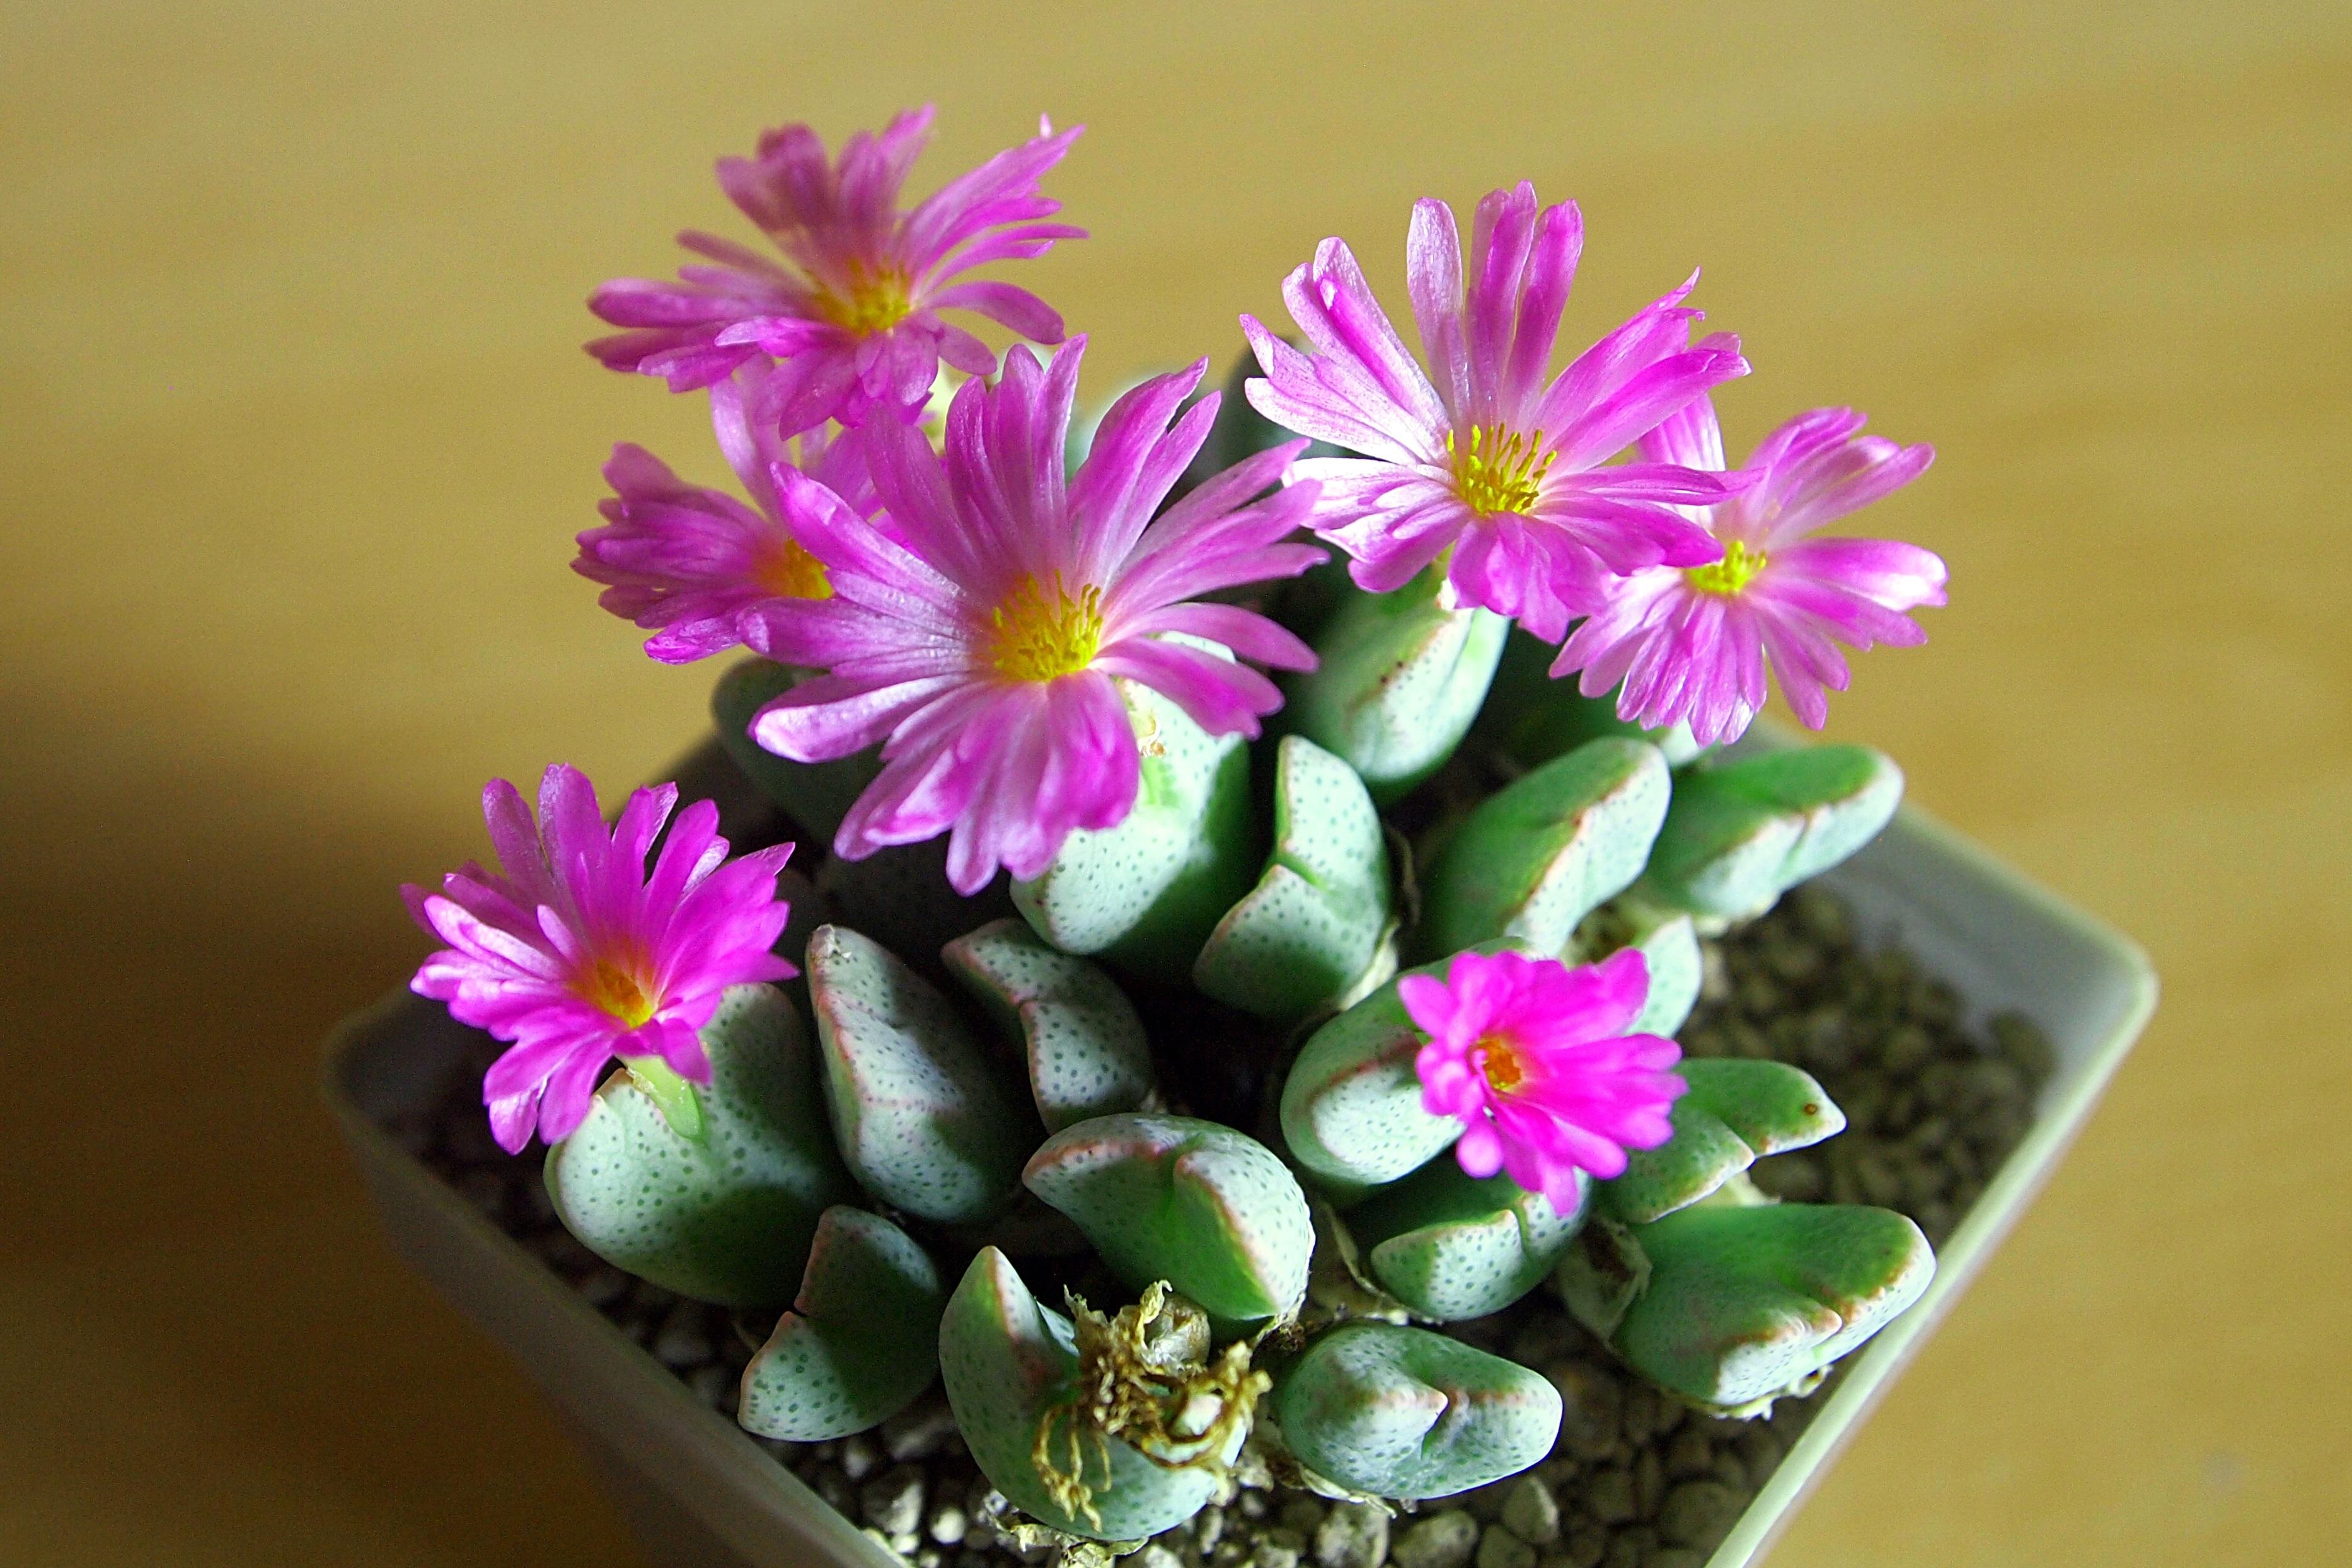 Gambar mekar menanam daun bunga berkembang musim semi botani berwarna merah muda Flora Budidaya Bunga bunga merah muda fotografi makro